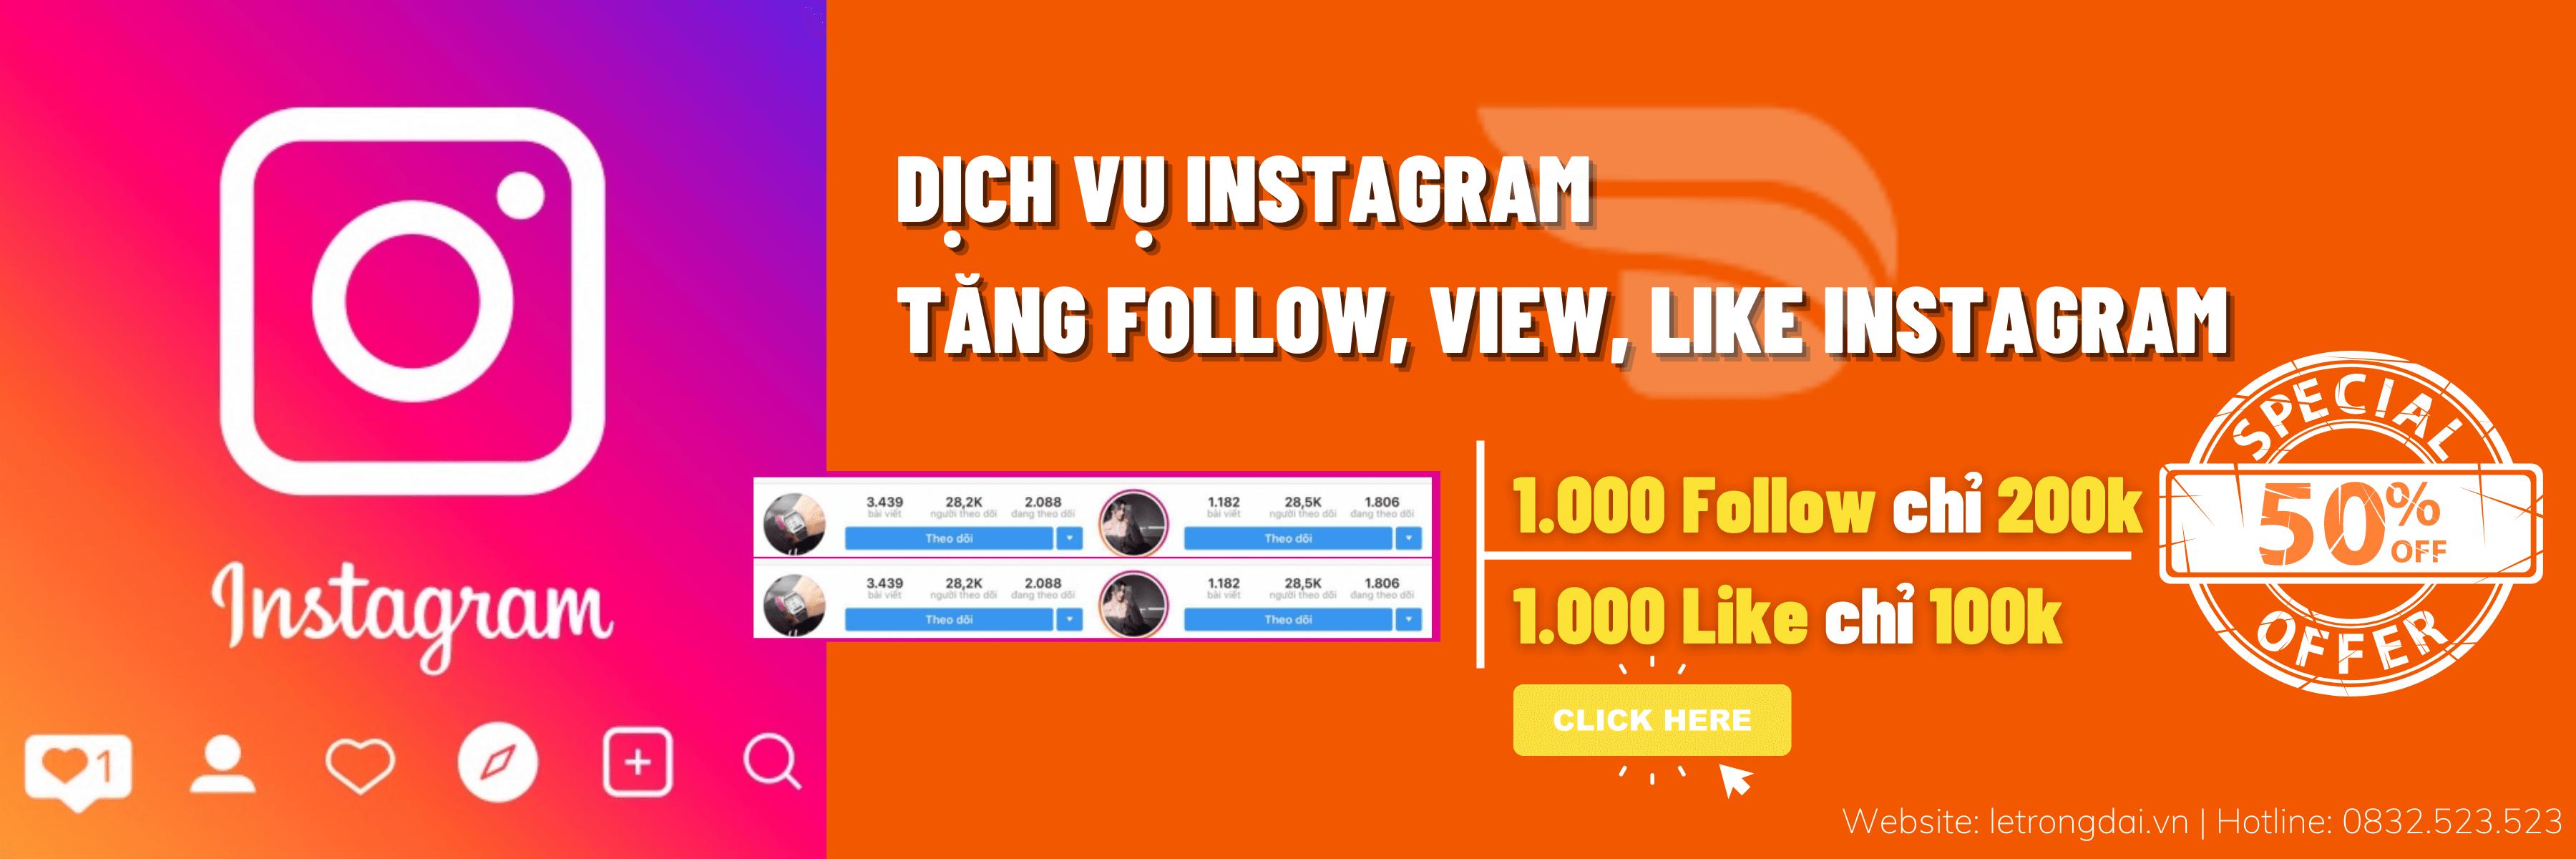 Dịch Vụ Instagram